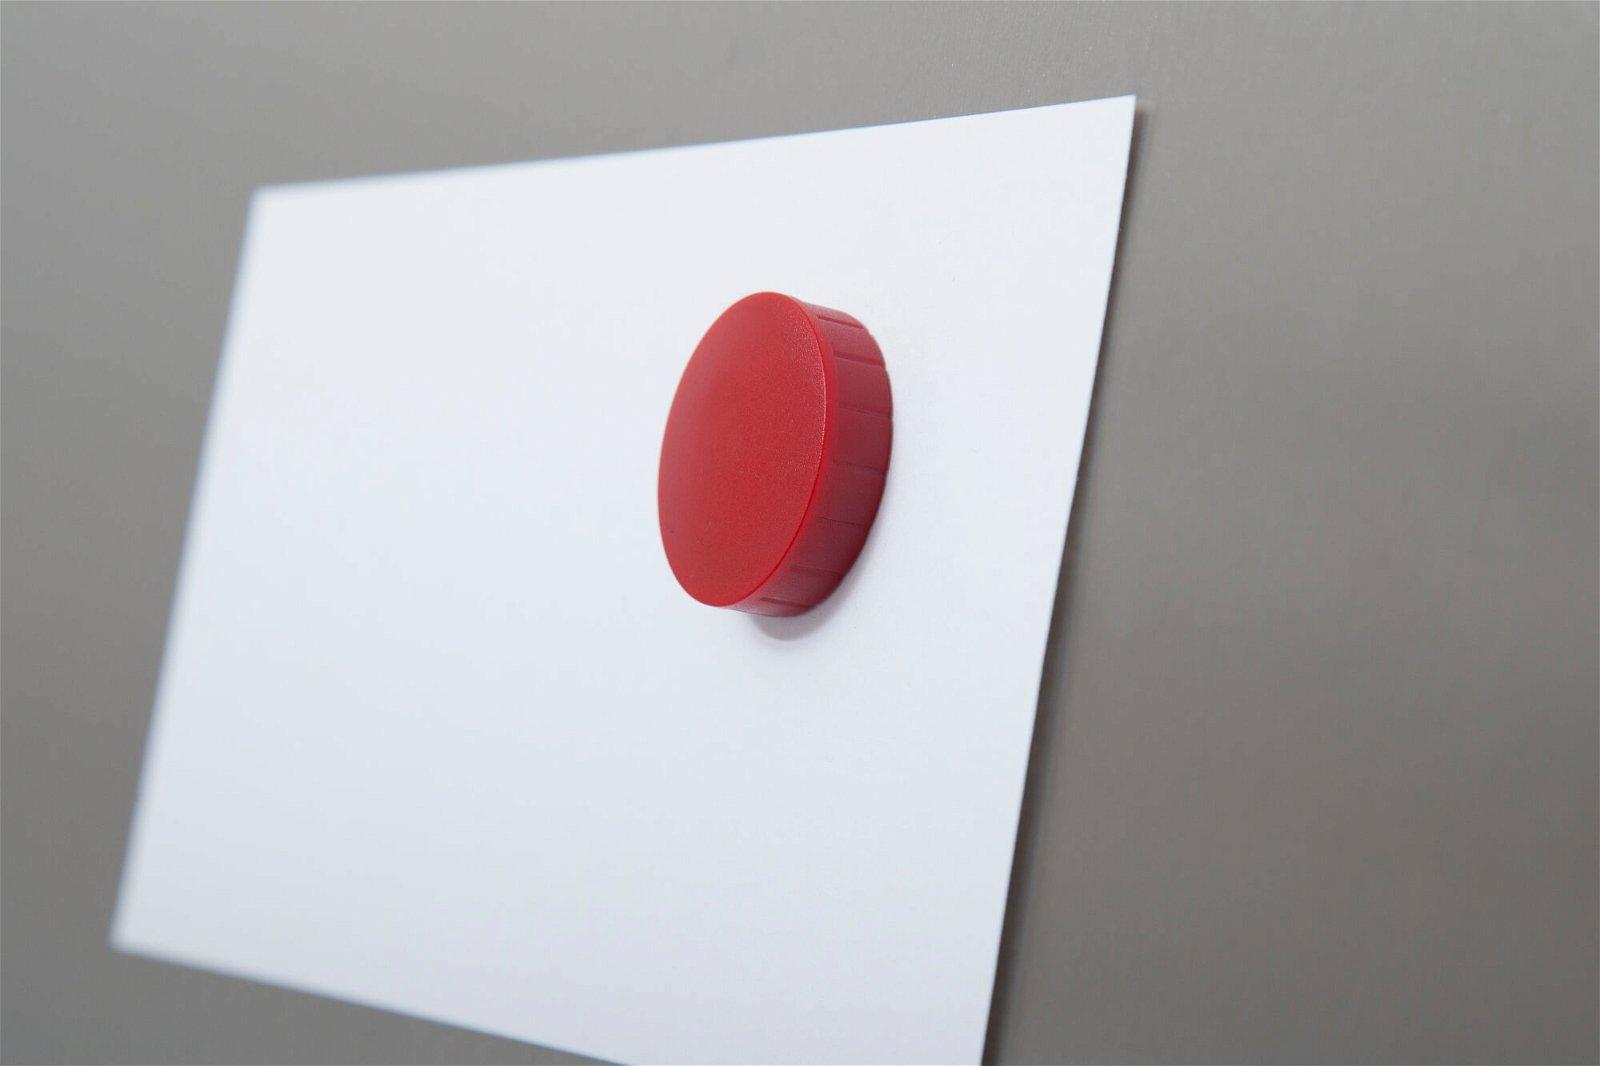 Magnet MAULsolid Ø 32 mm, 0,8 kg Haftkraft, 10 St./Ktn., rot